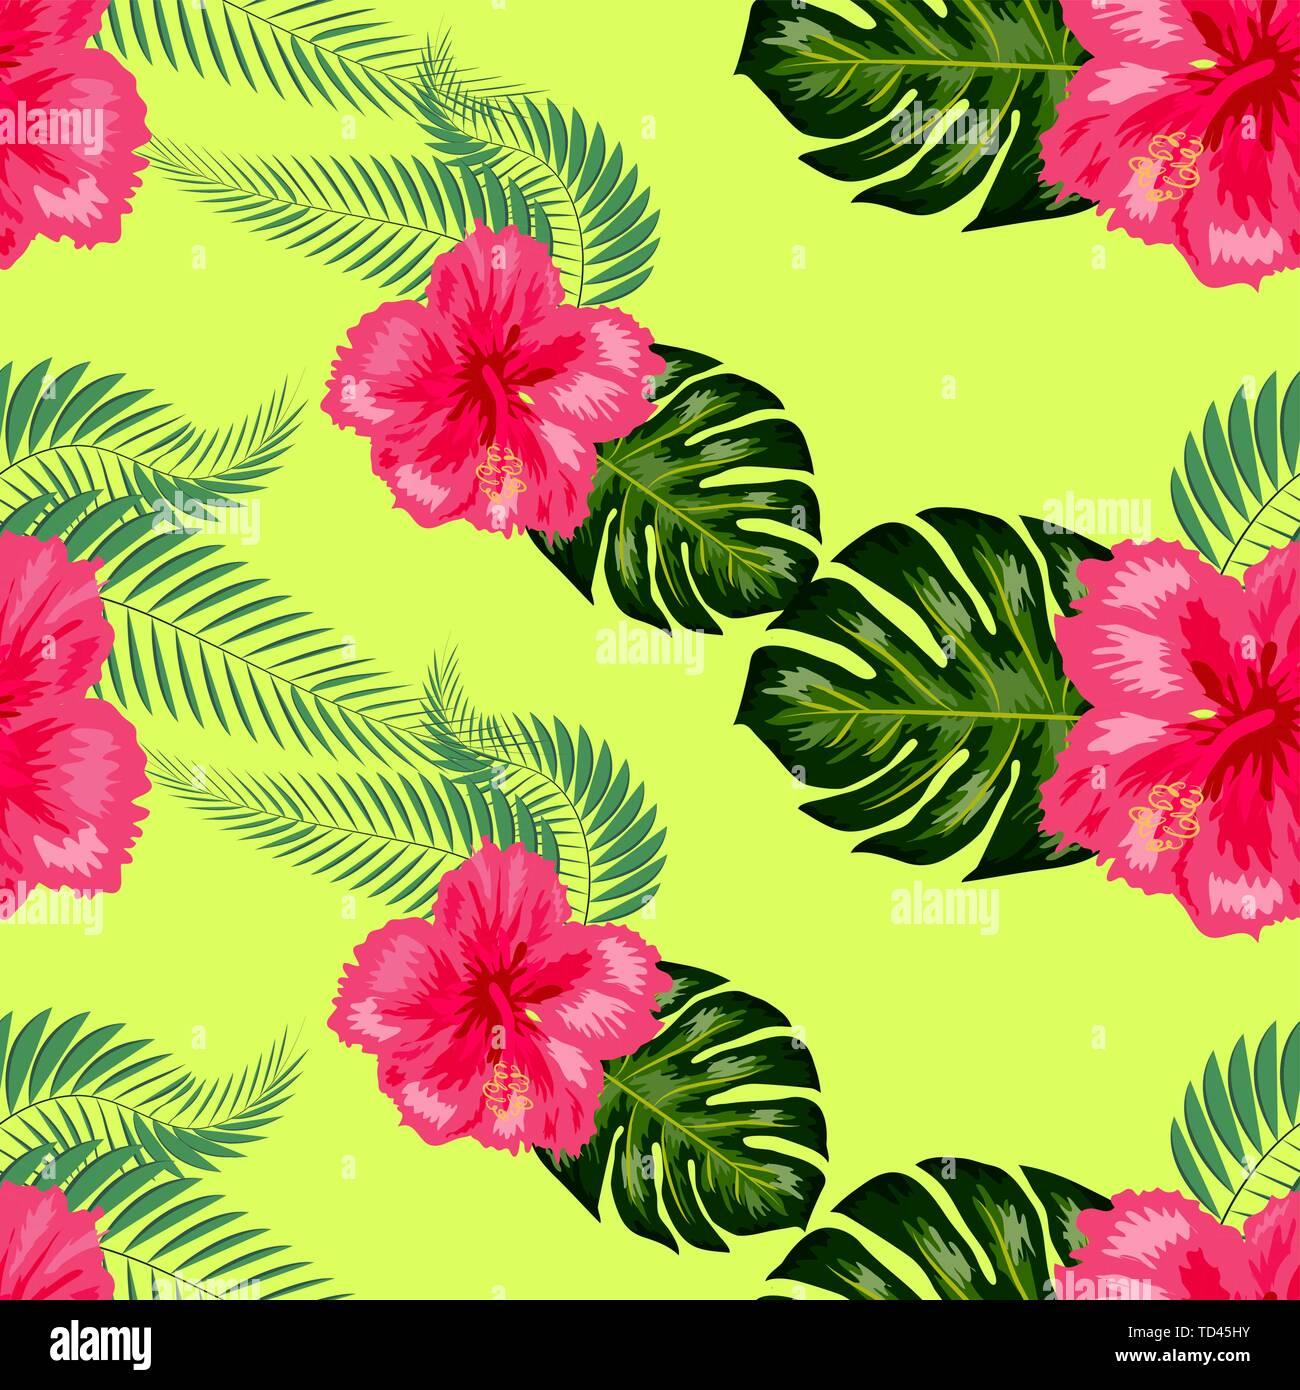 Tropical Vintage Hibiscus Plumeria Floral Green Leaves Seamless